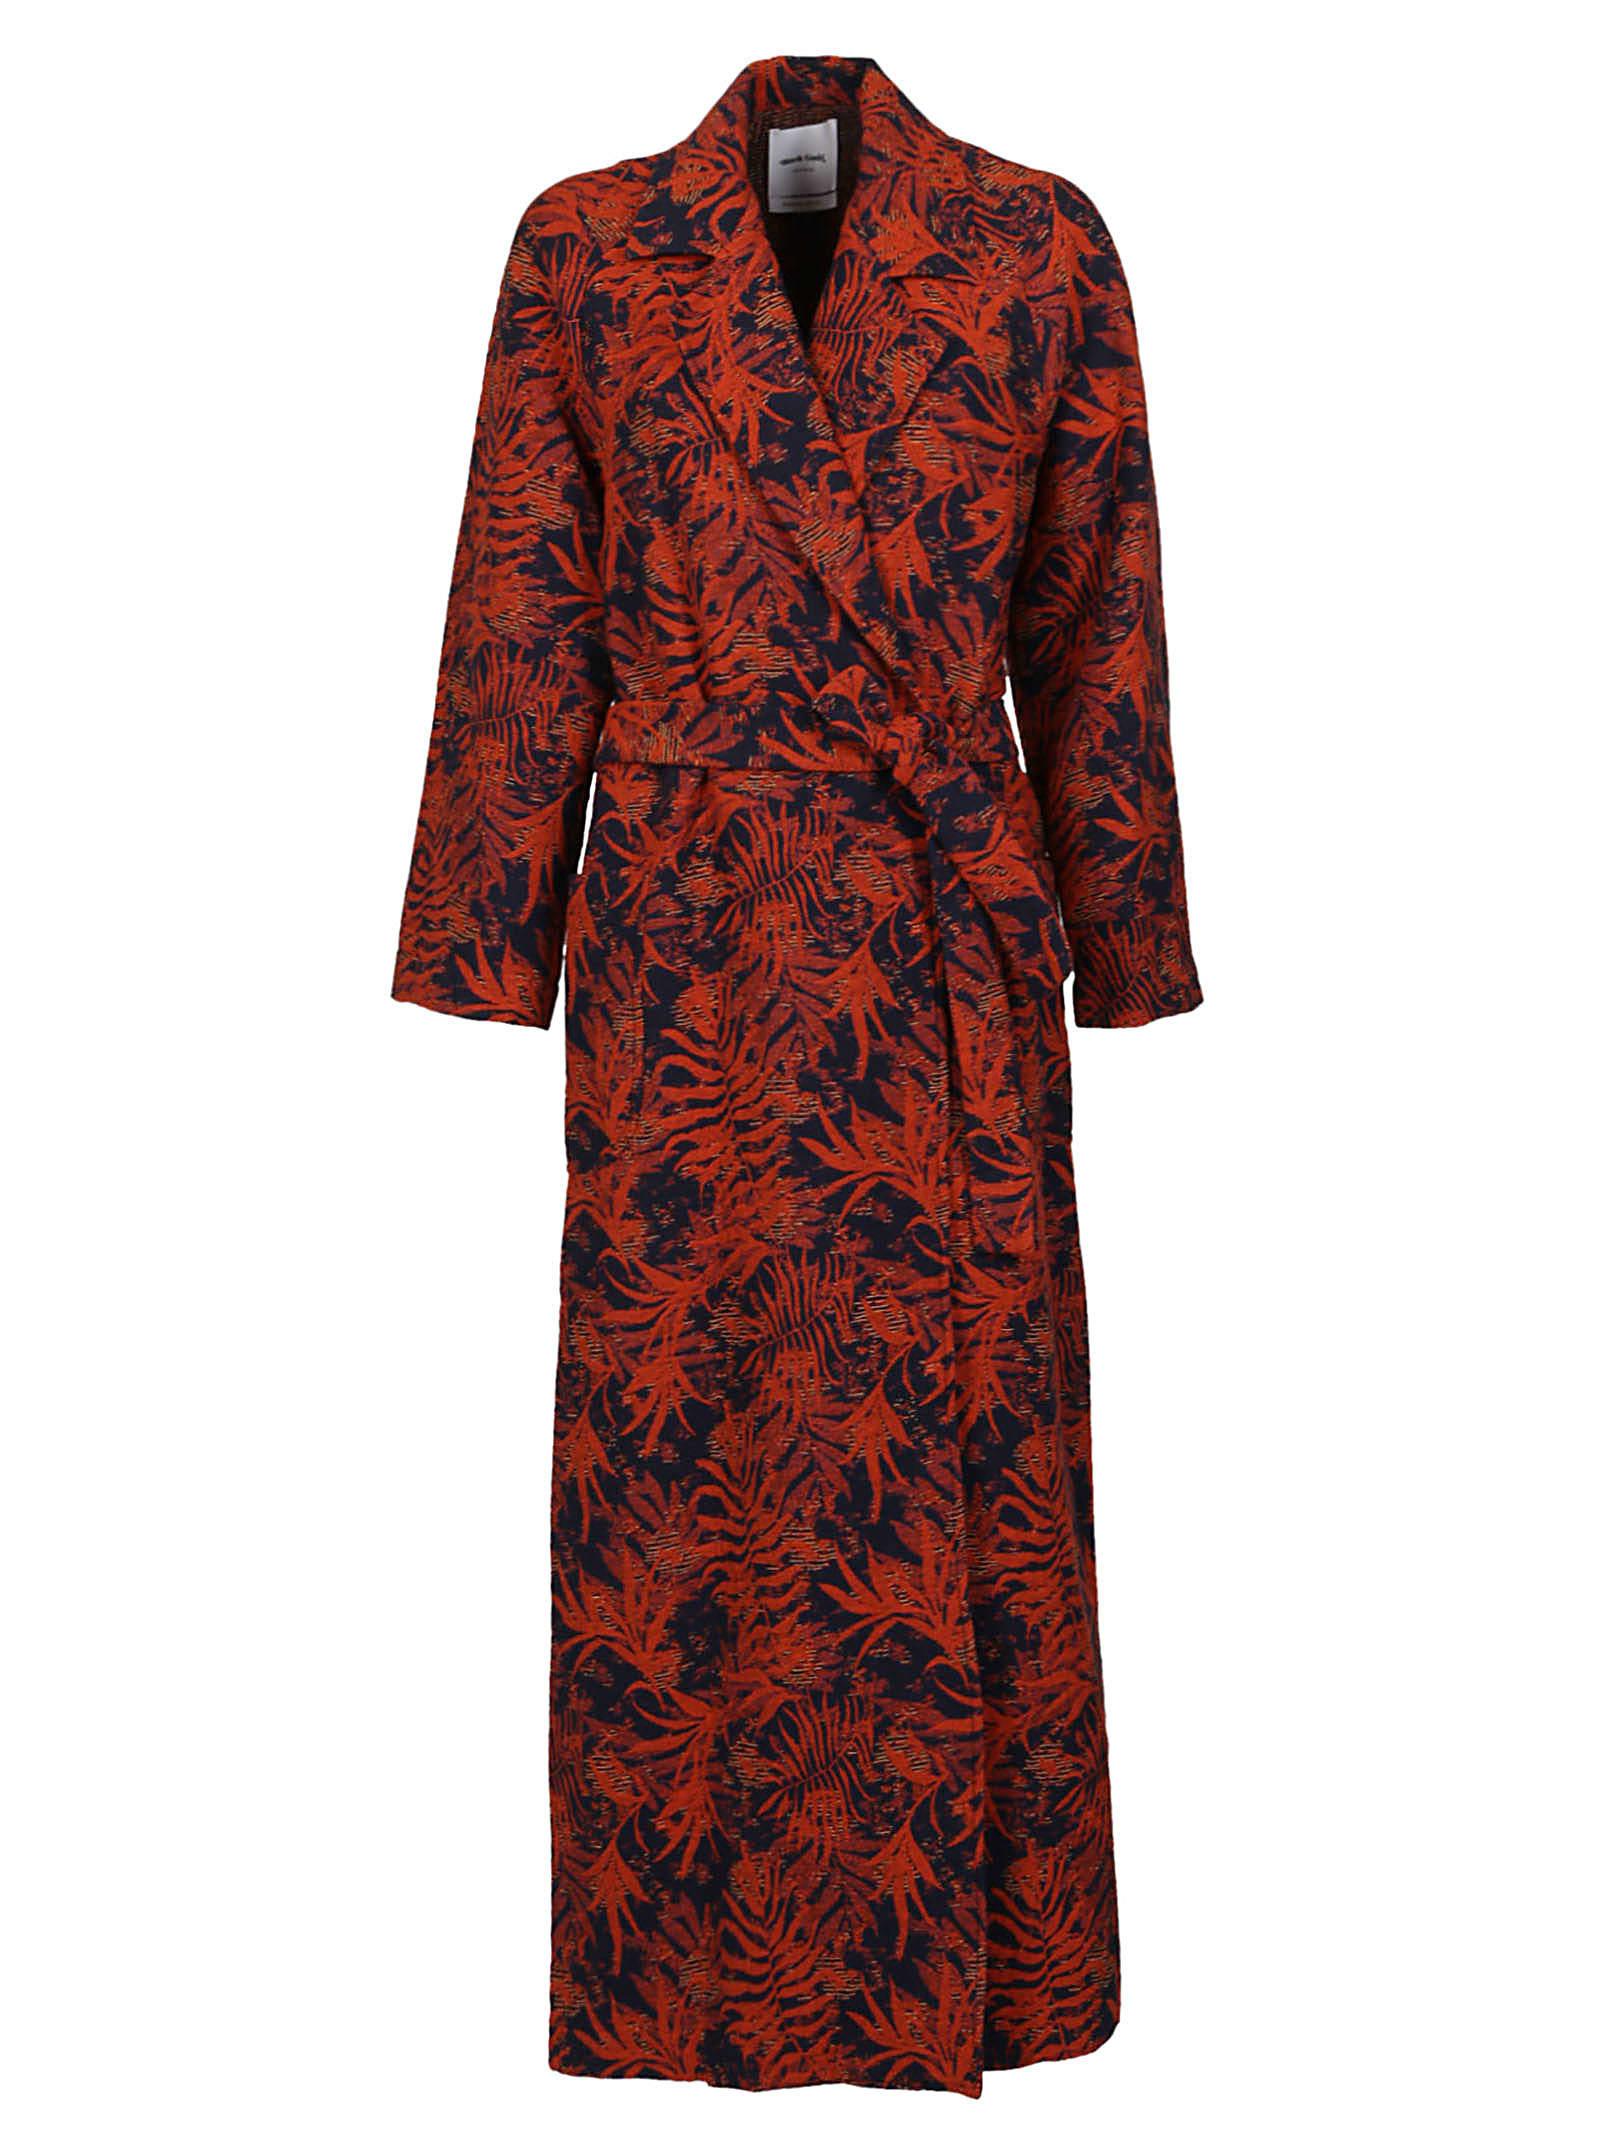 Black Coral Coat